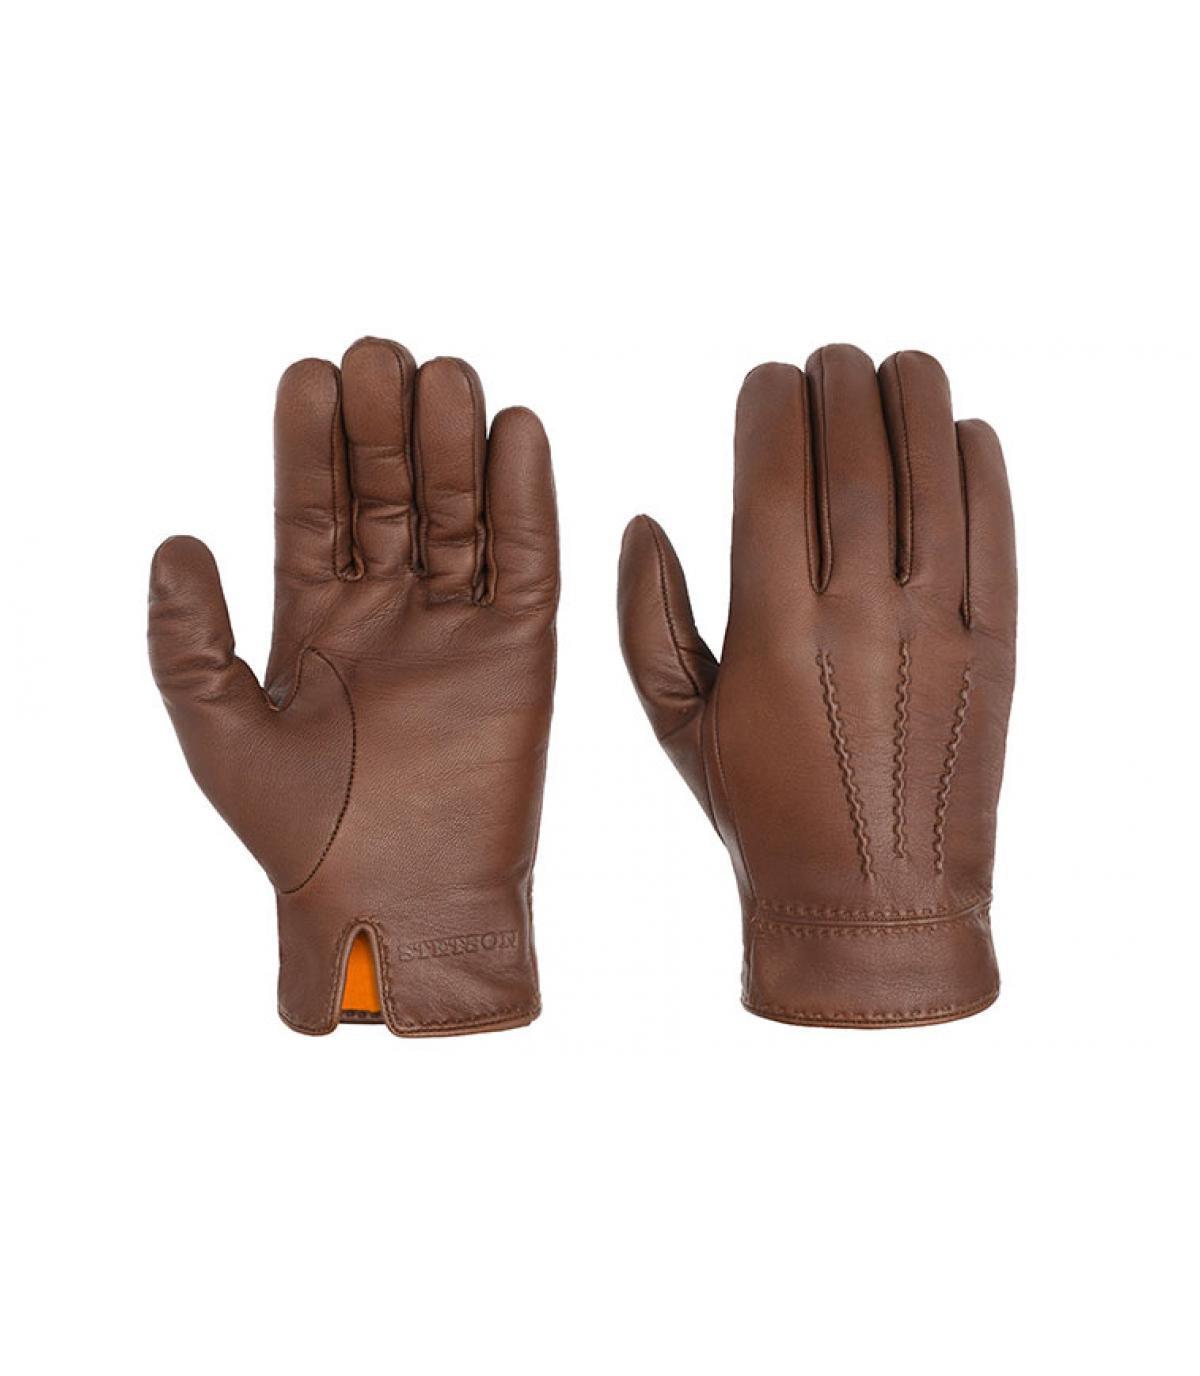 Handschuhe Leder braun Stetson